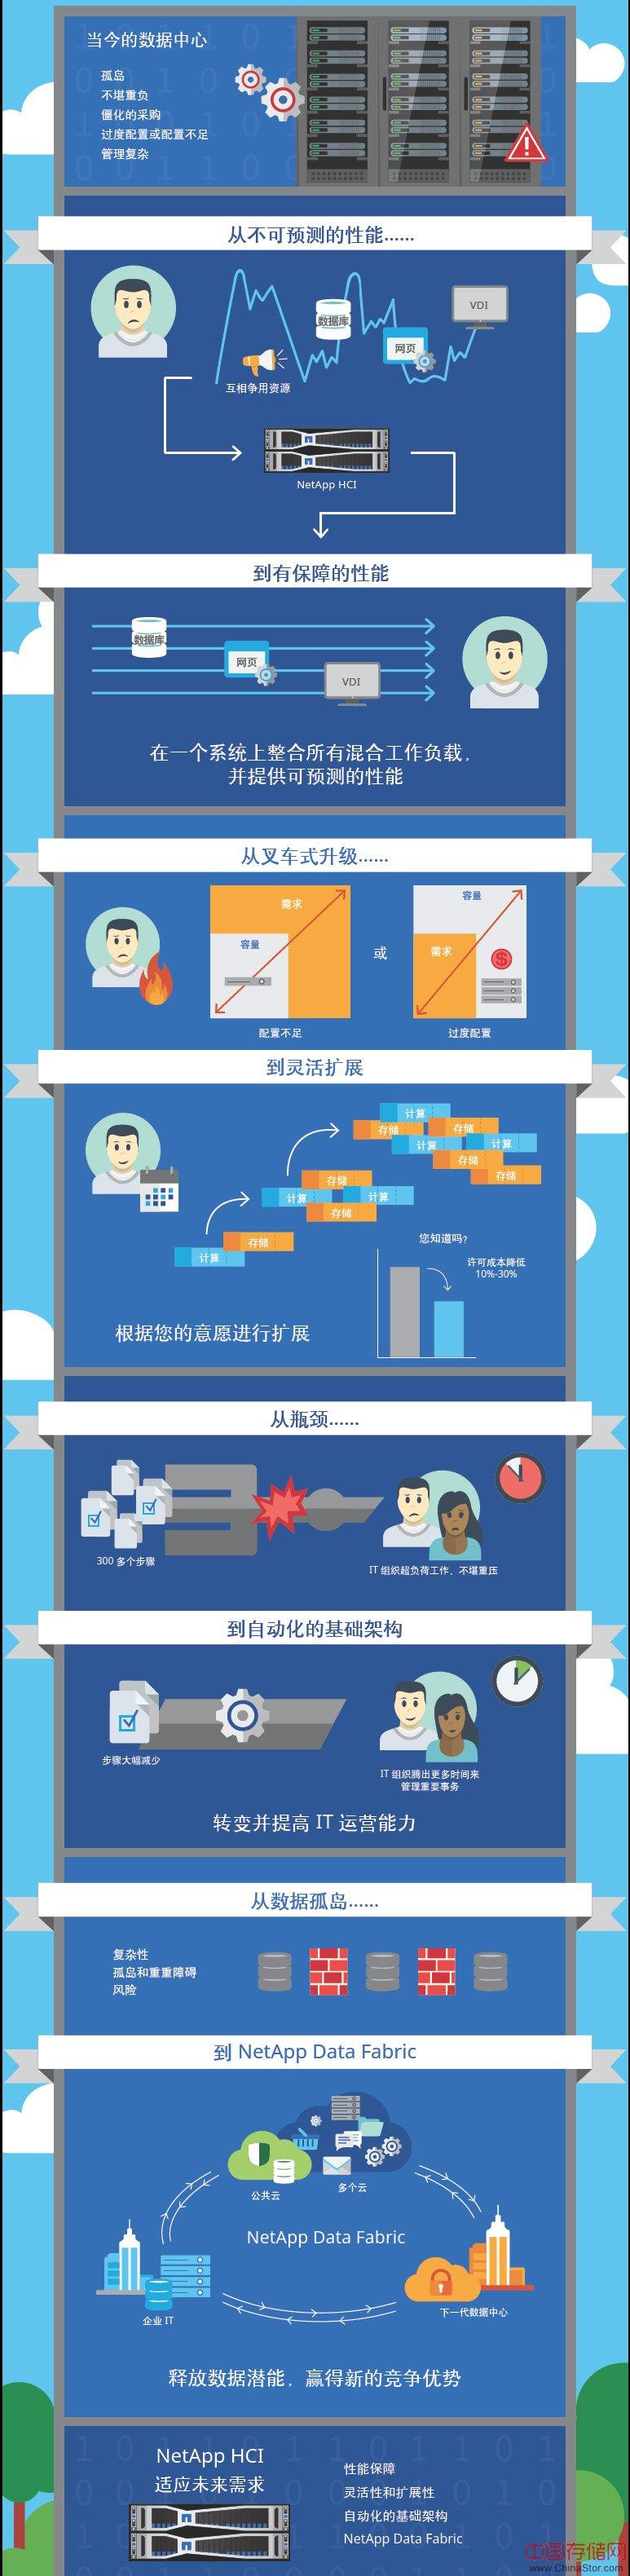 NetApp HCI新一代企业级超融合基础架构